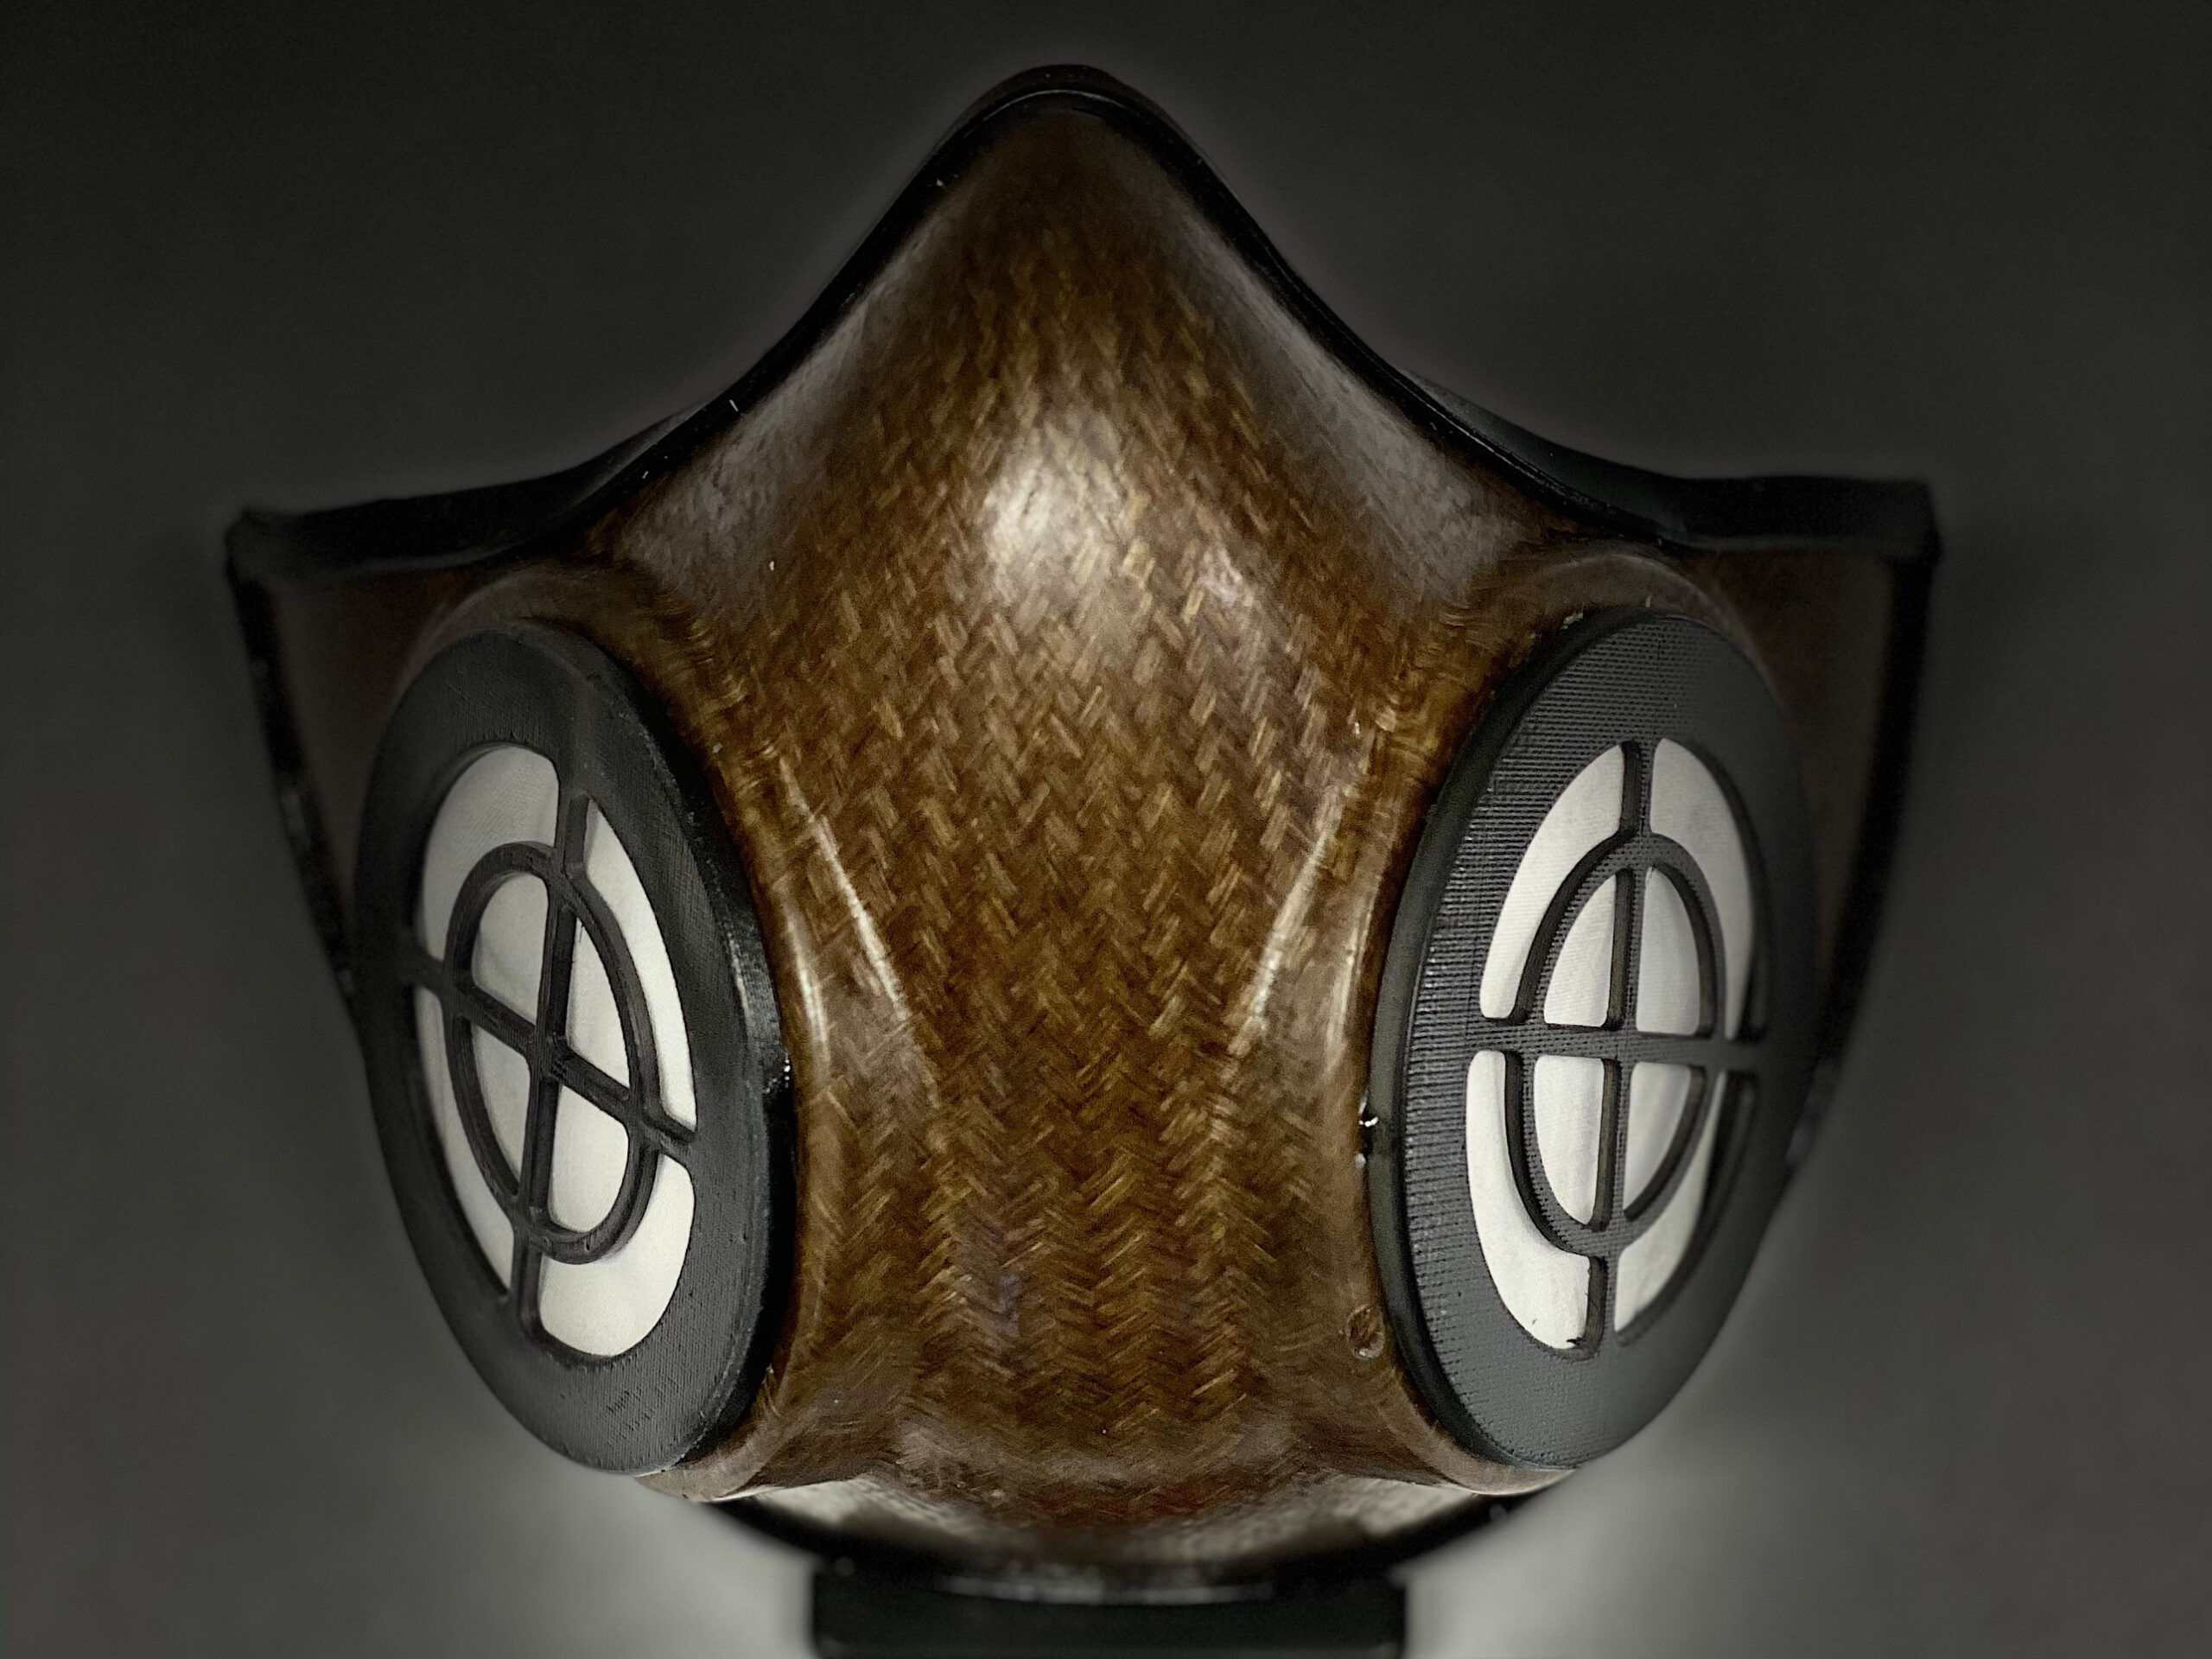 Medical face masks made with natural fibres